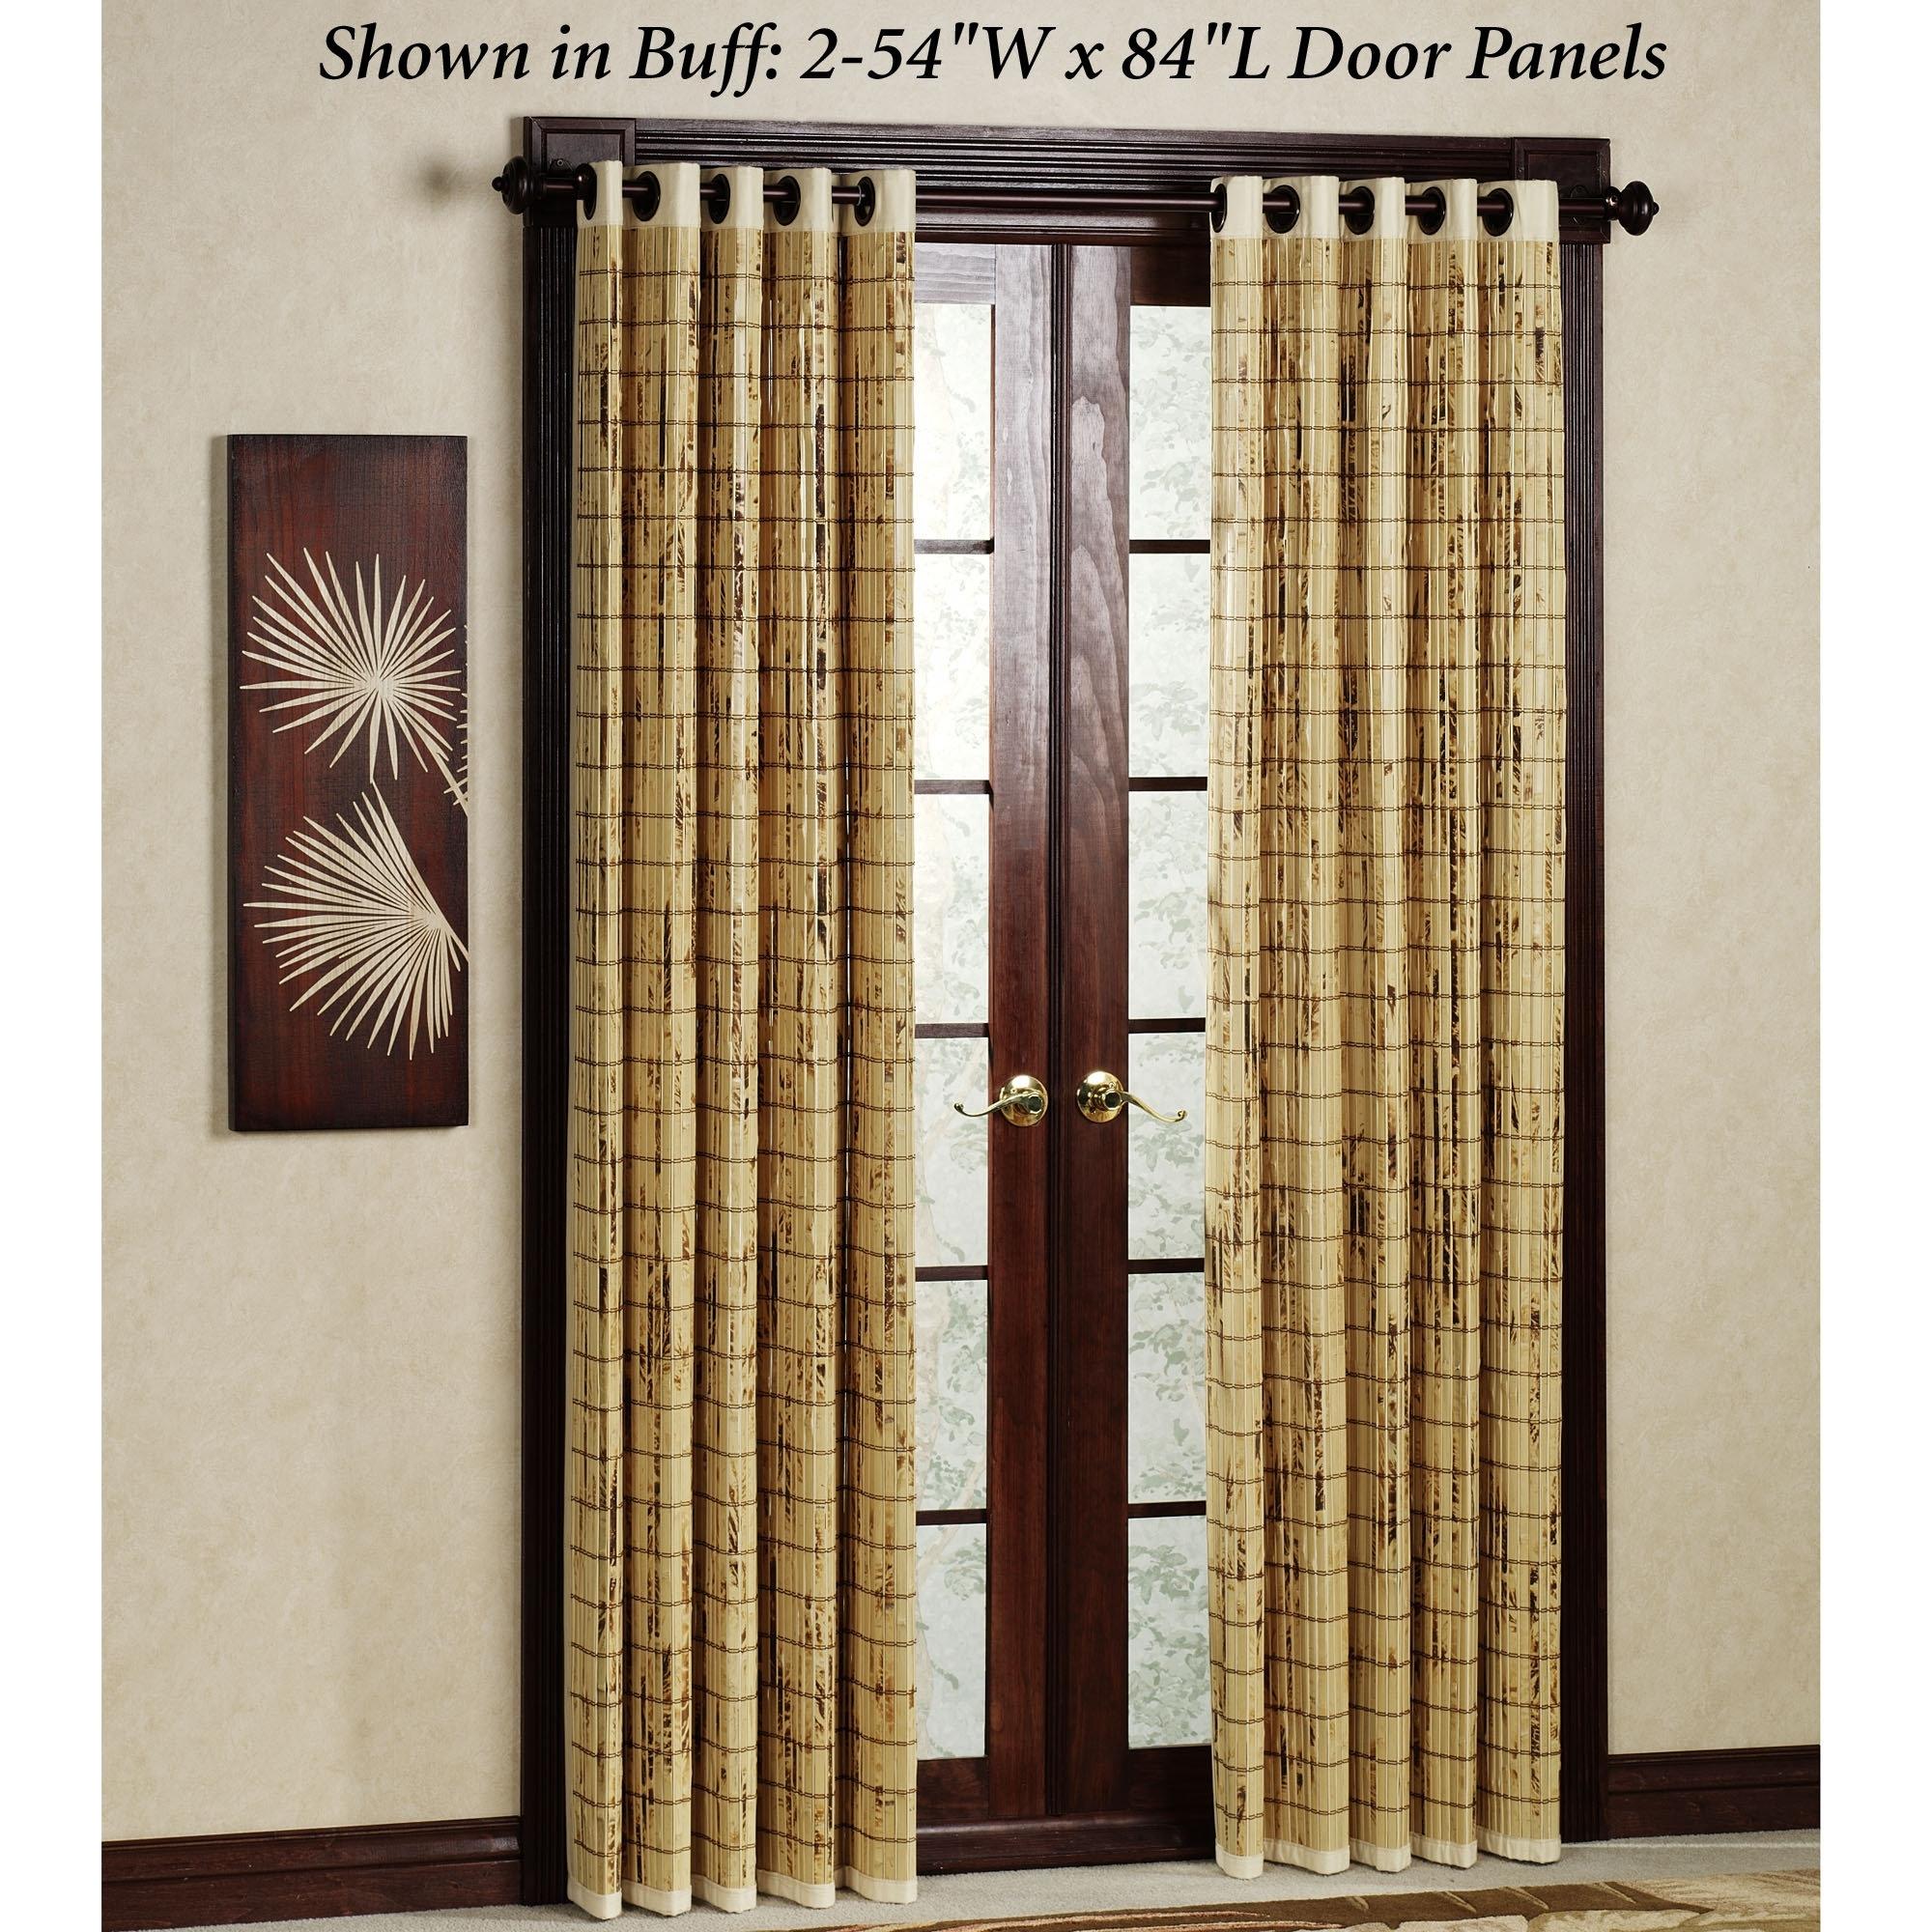 Bamboo Sliding Panels For Patio Doorsbamboo sliding panels for patio doors sliding doors design